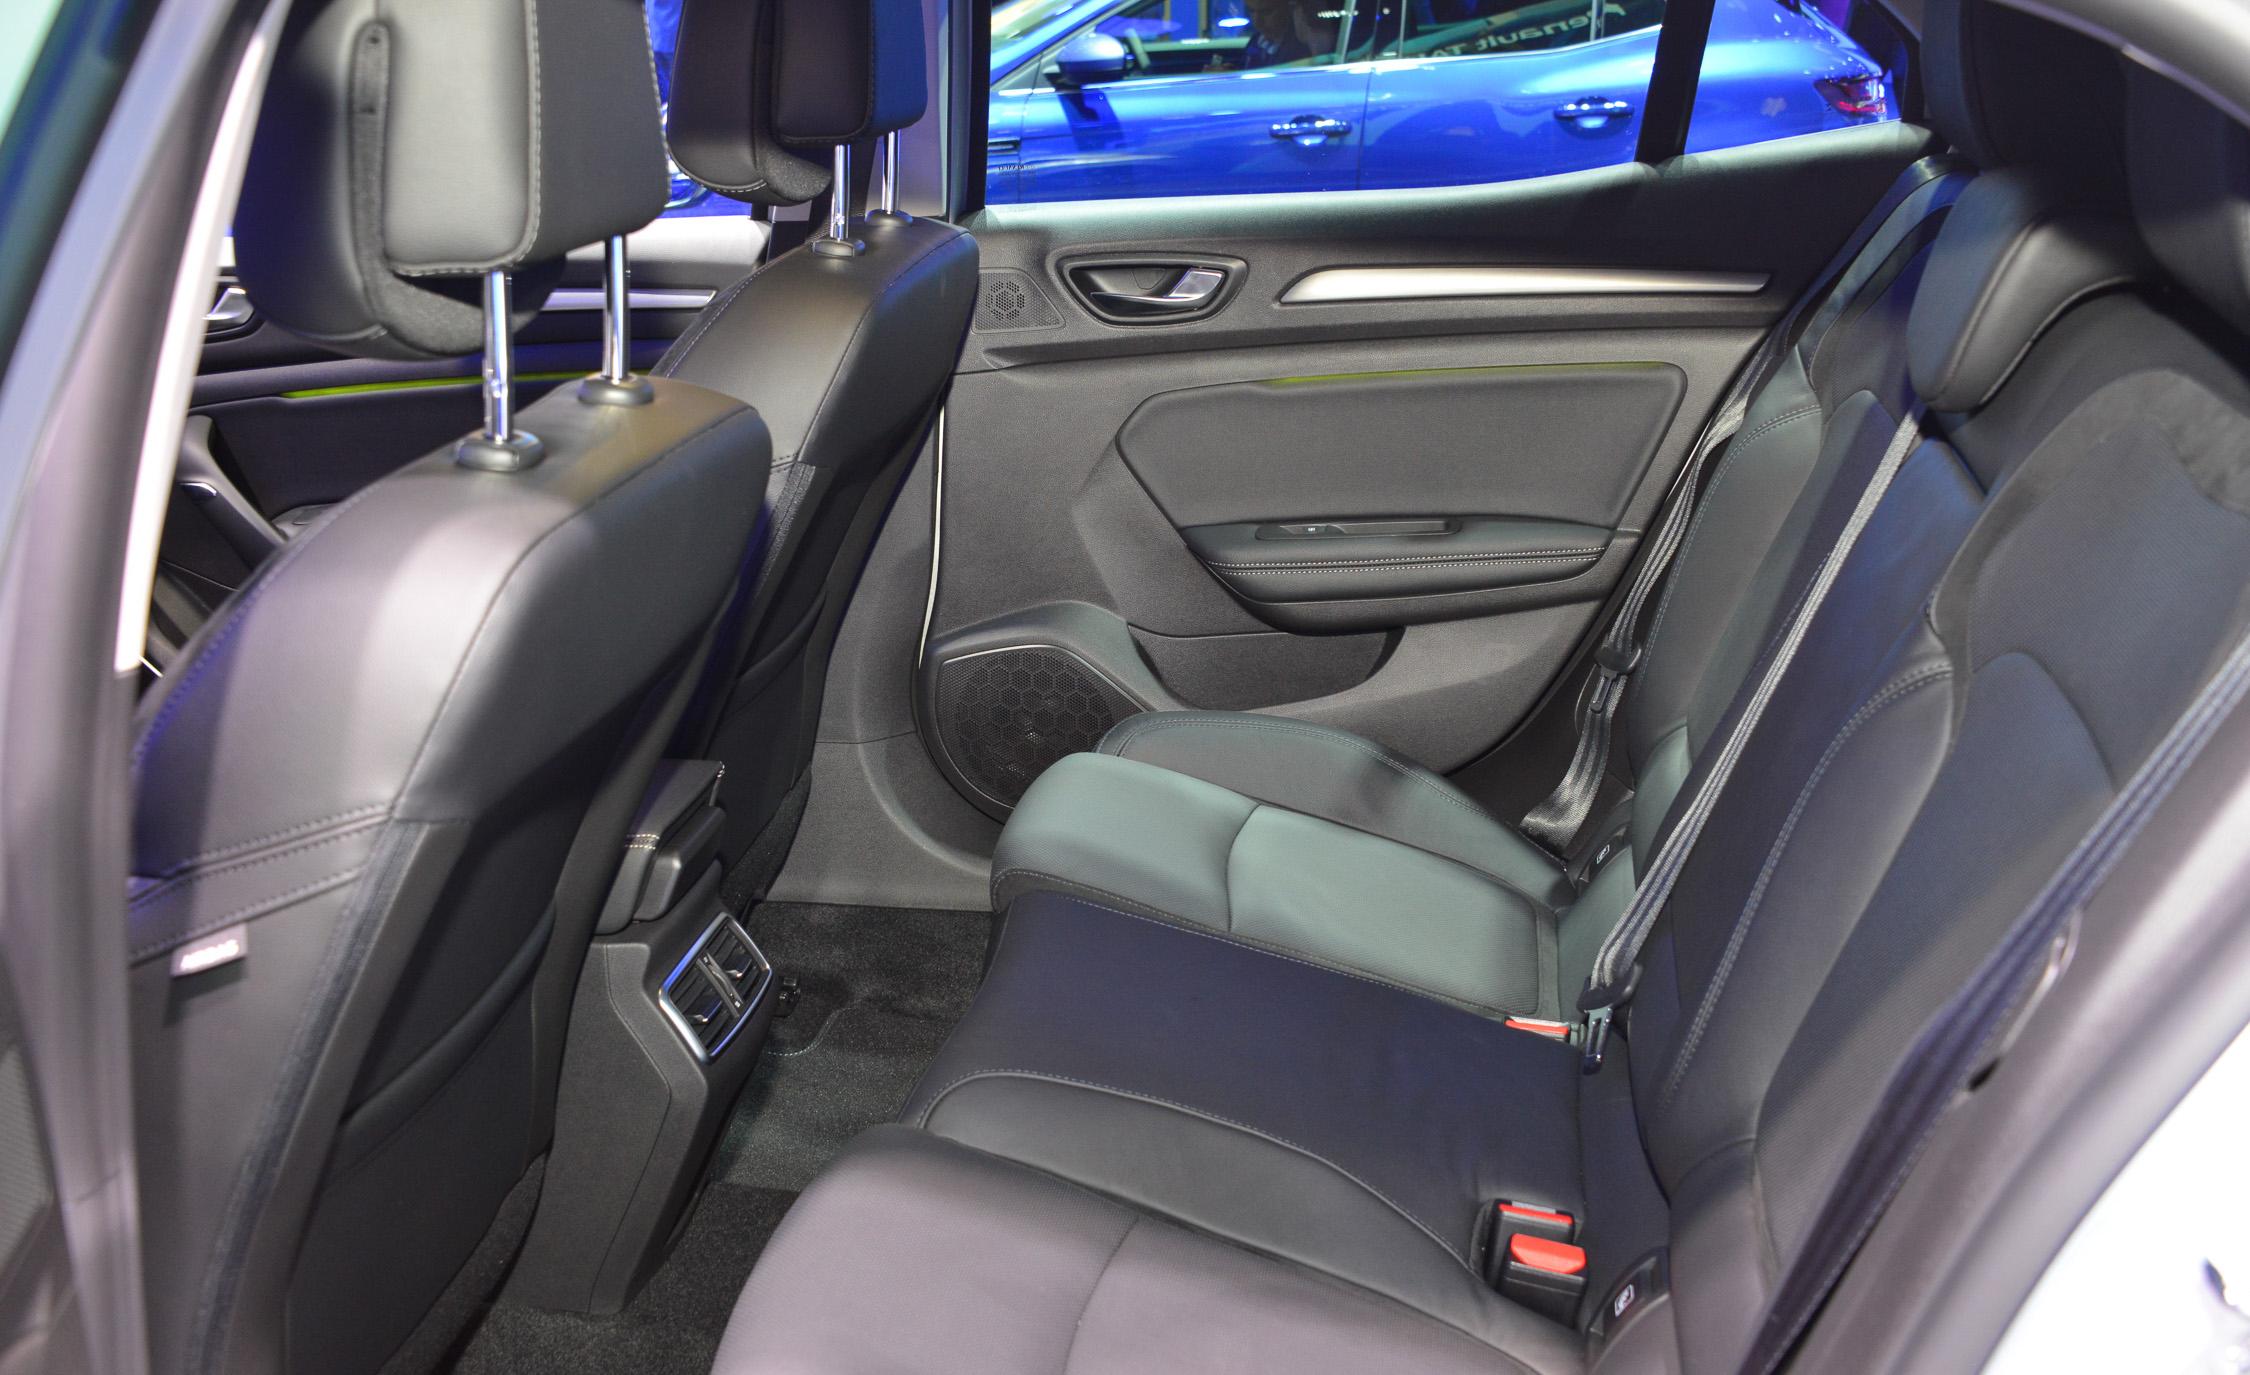 2016 Renault Megane Rear Seats Interior